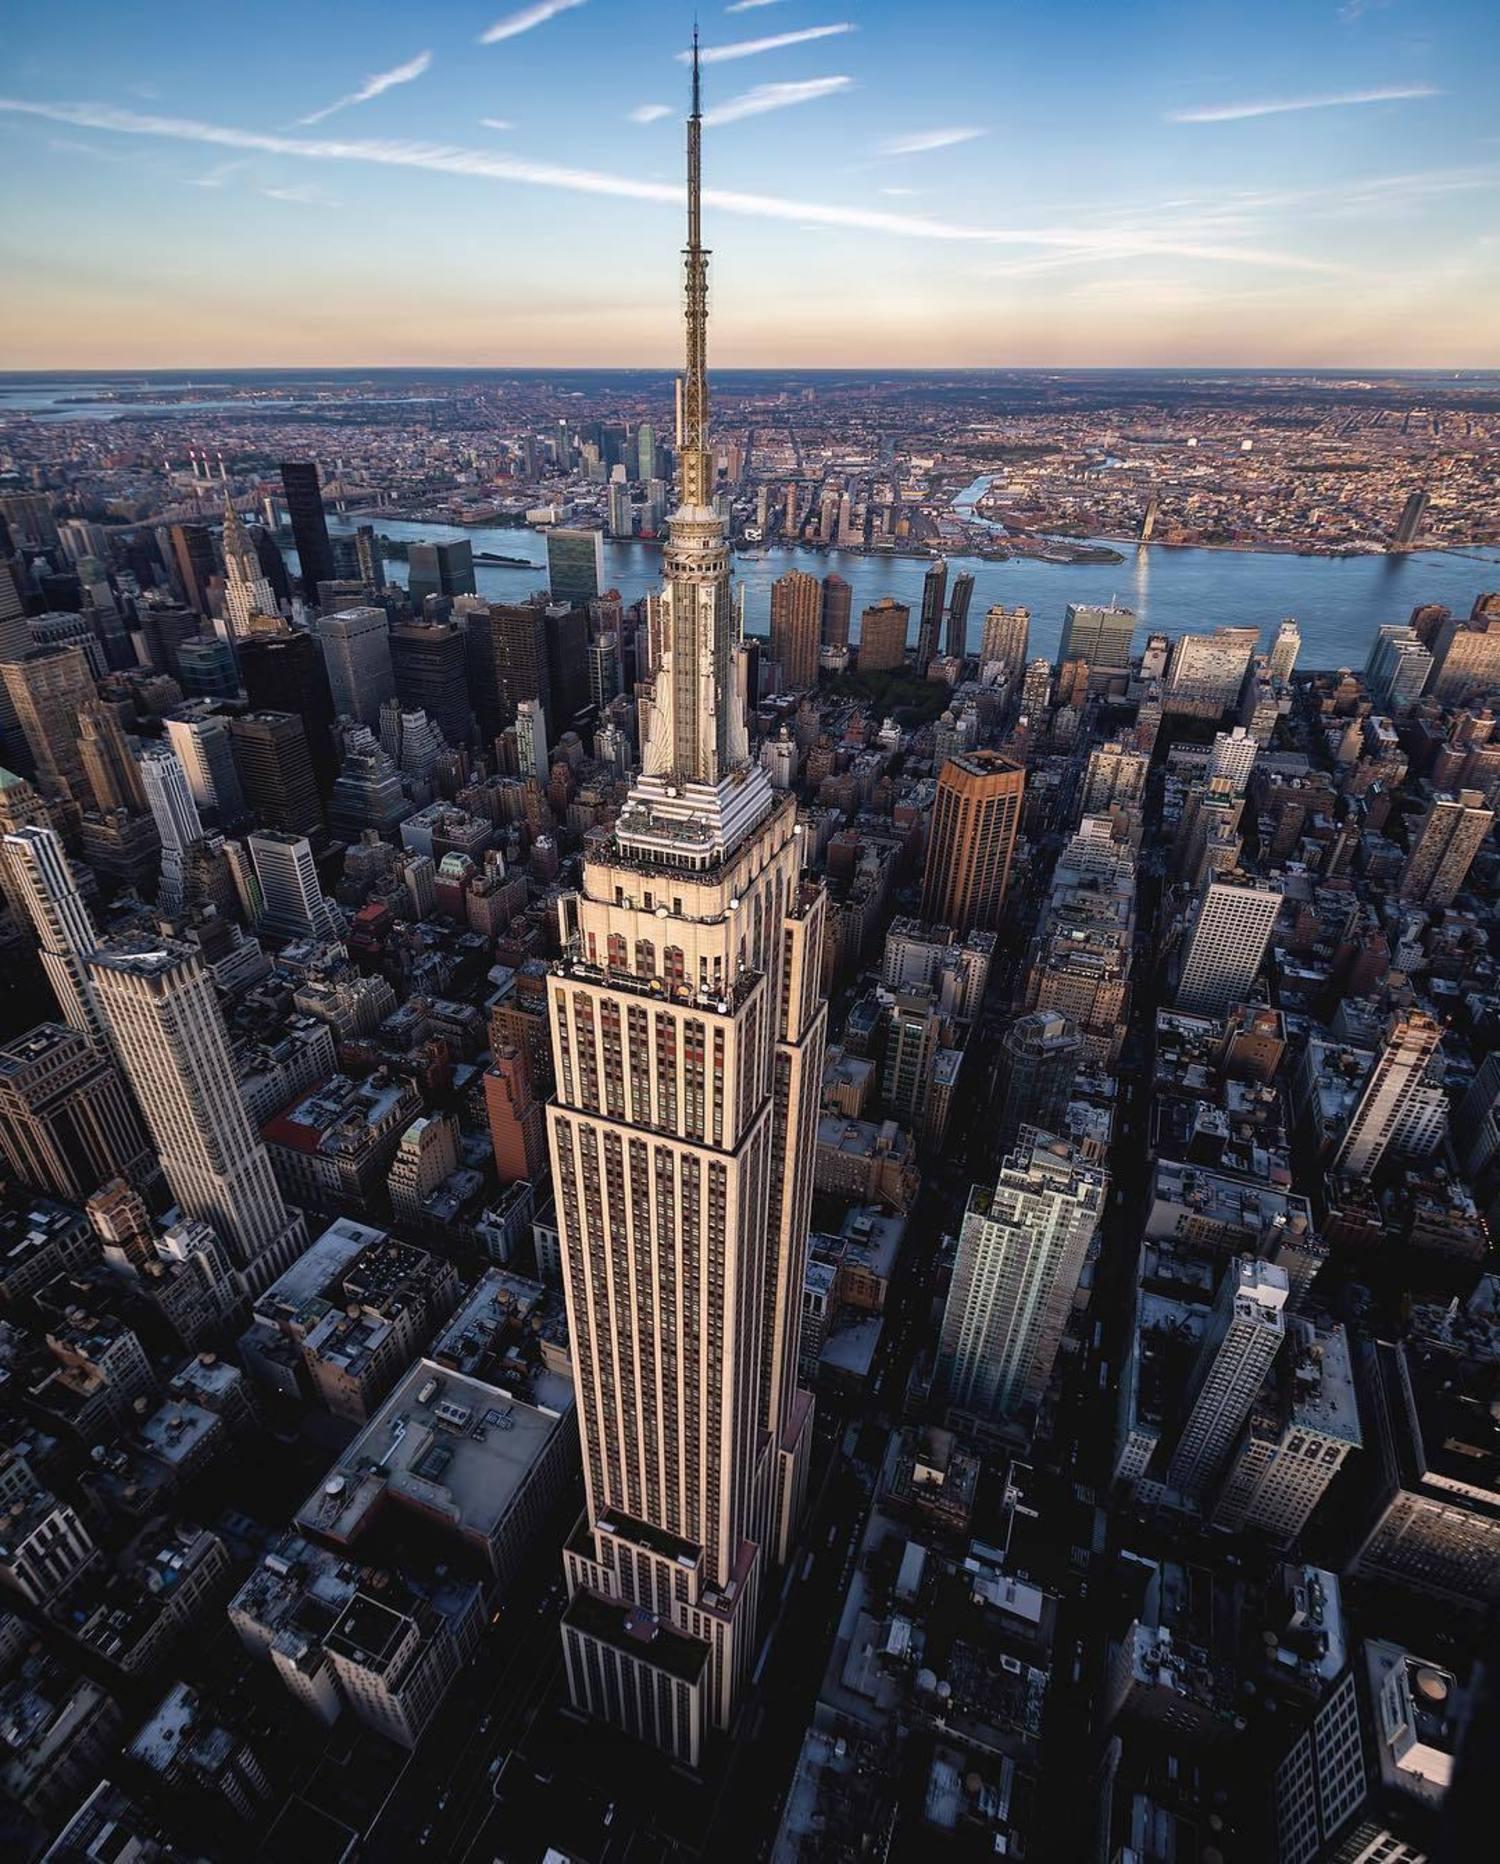 Empire State Building, New York, New York. Photo via @beholdingeye #viewingnyc #nyc #newyork #newyorkcity #empirestatebuilding